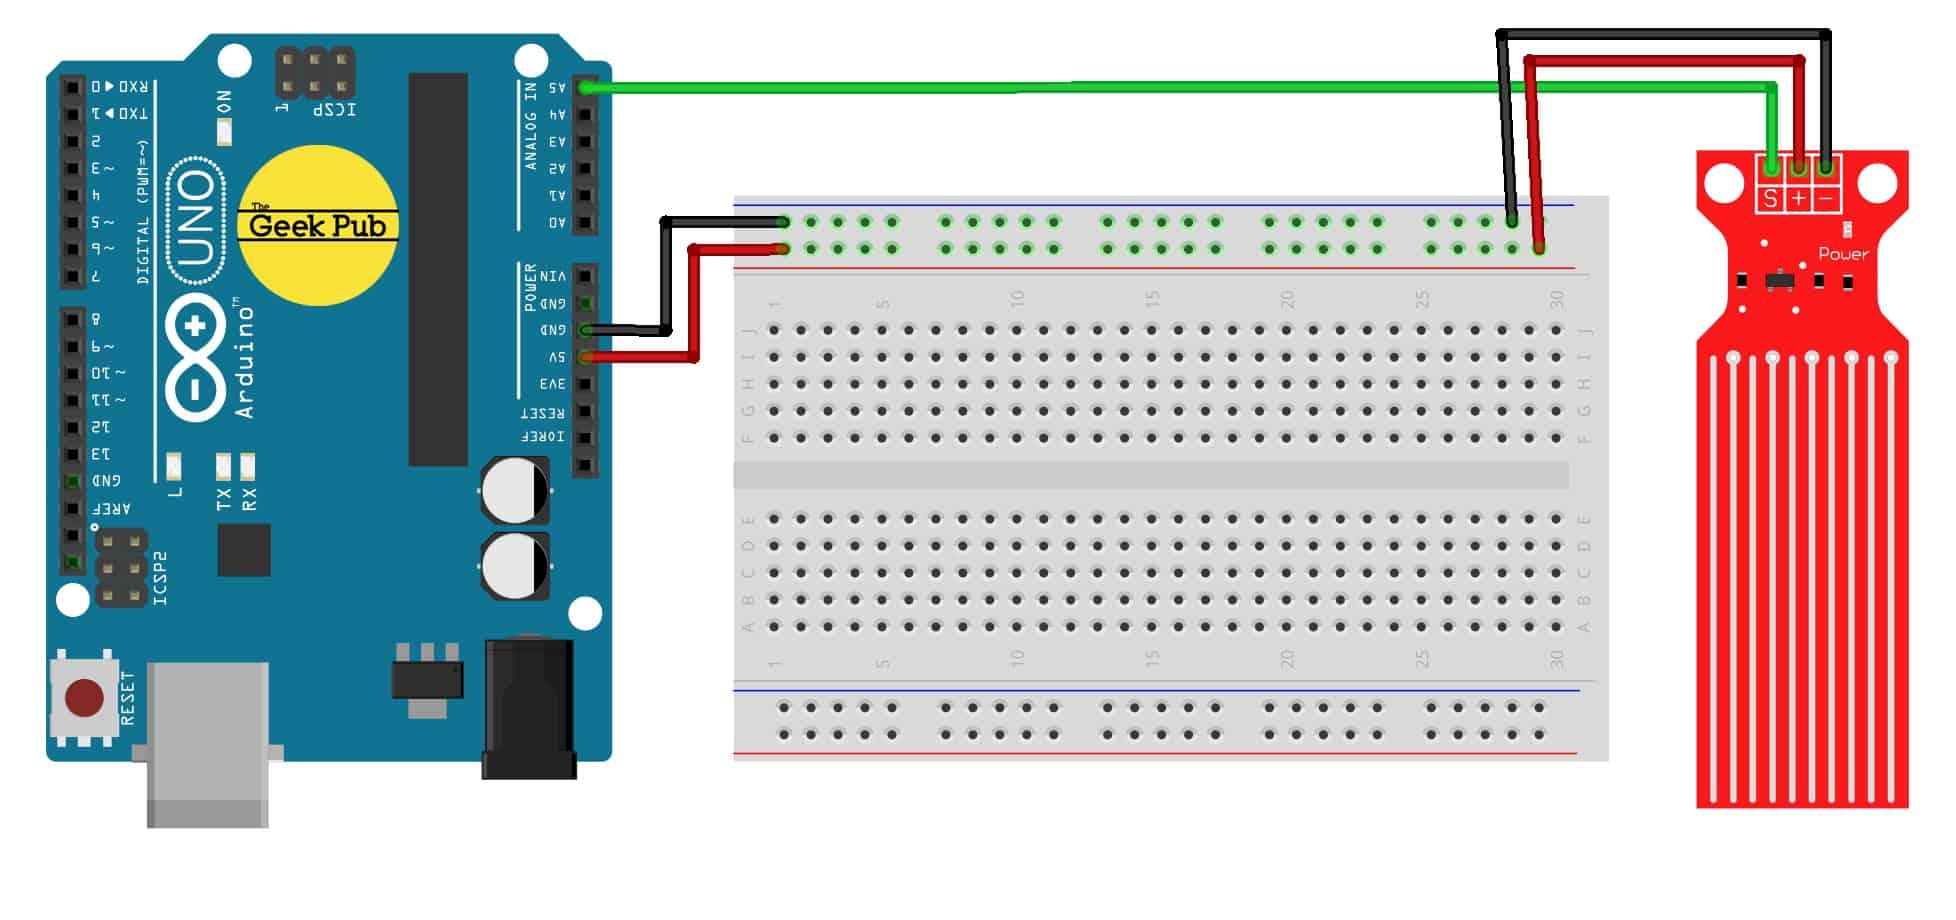 Arduino Water    Level       Sensor    Tutorial  The Geek Pub